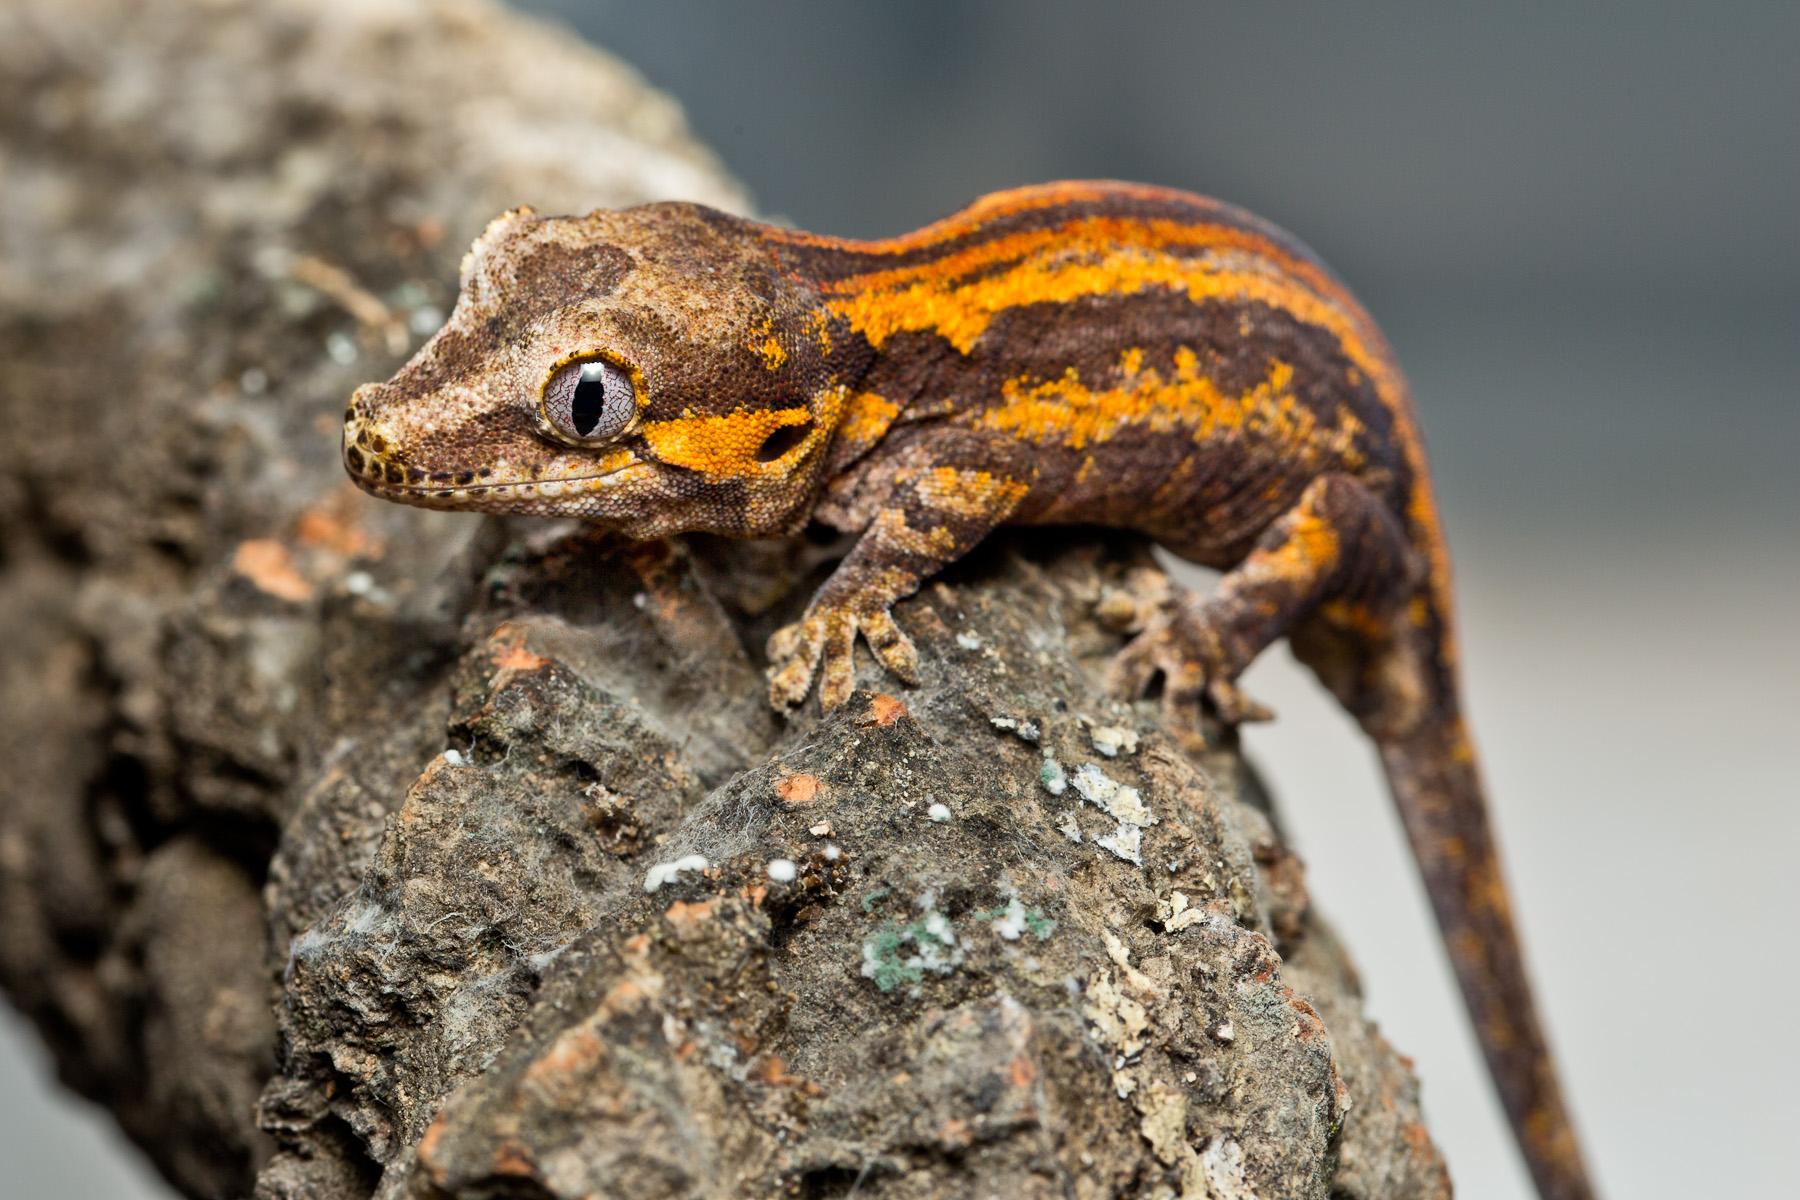 Rhacodactylusauriculatus1_sRGB_1800x1200_72ppi.jpg